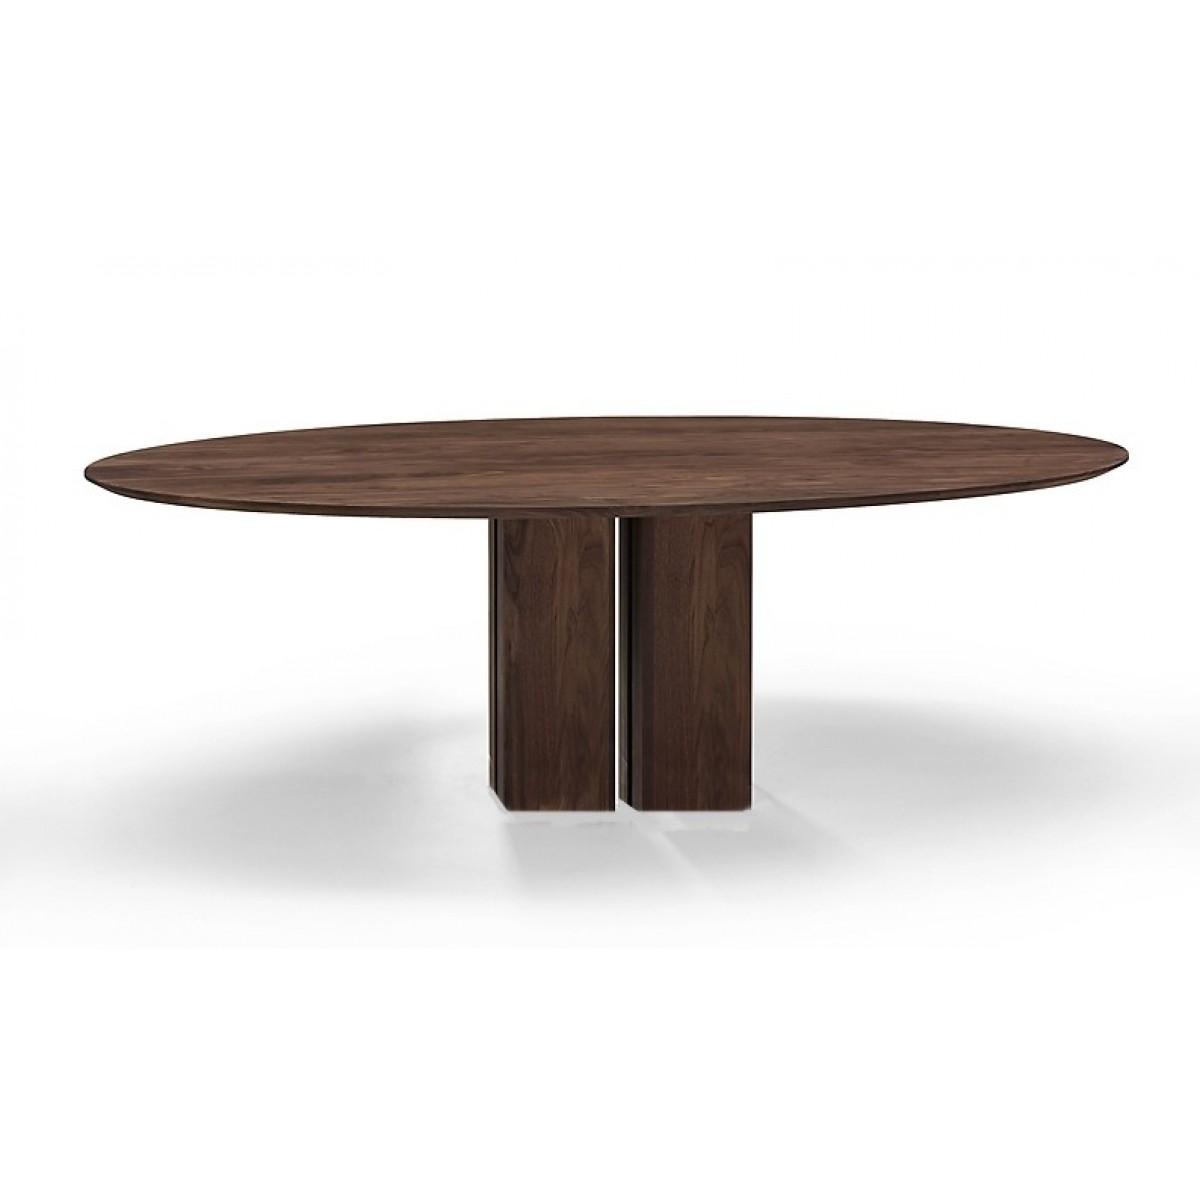 ovaal-ovale-tafel-eettafel-eetkamertafel-eiken-kolompoot-verjond-blad